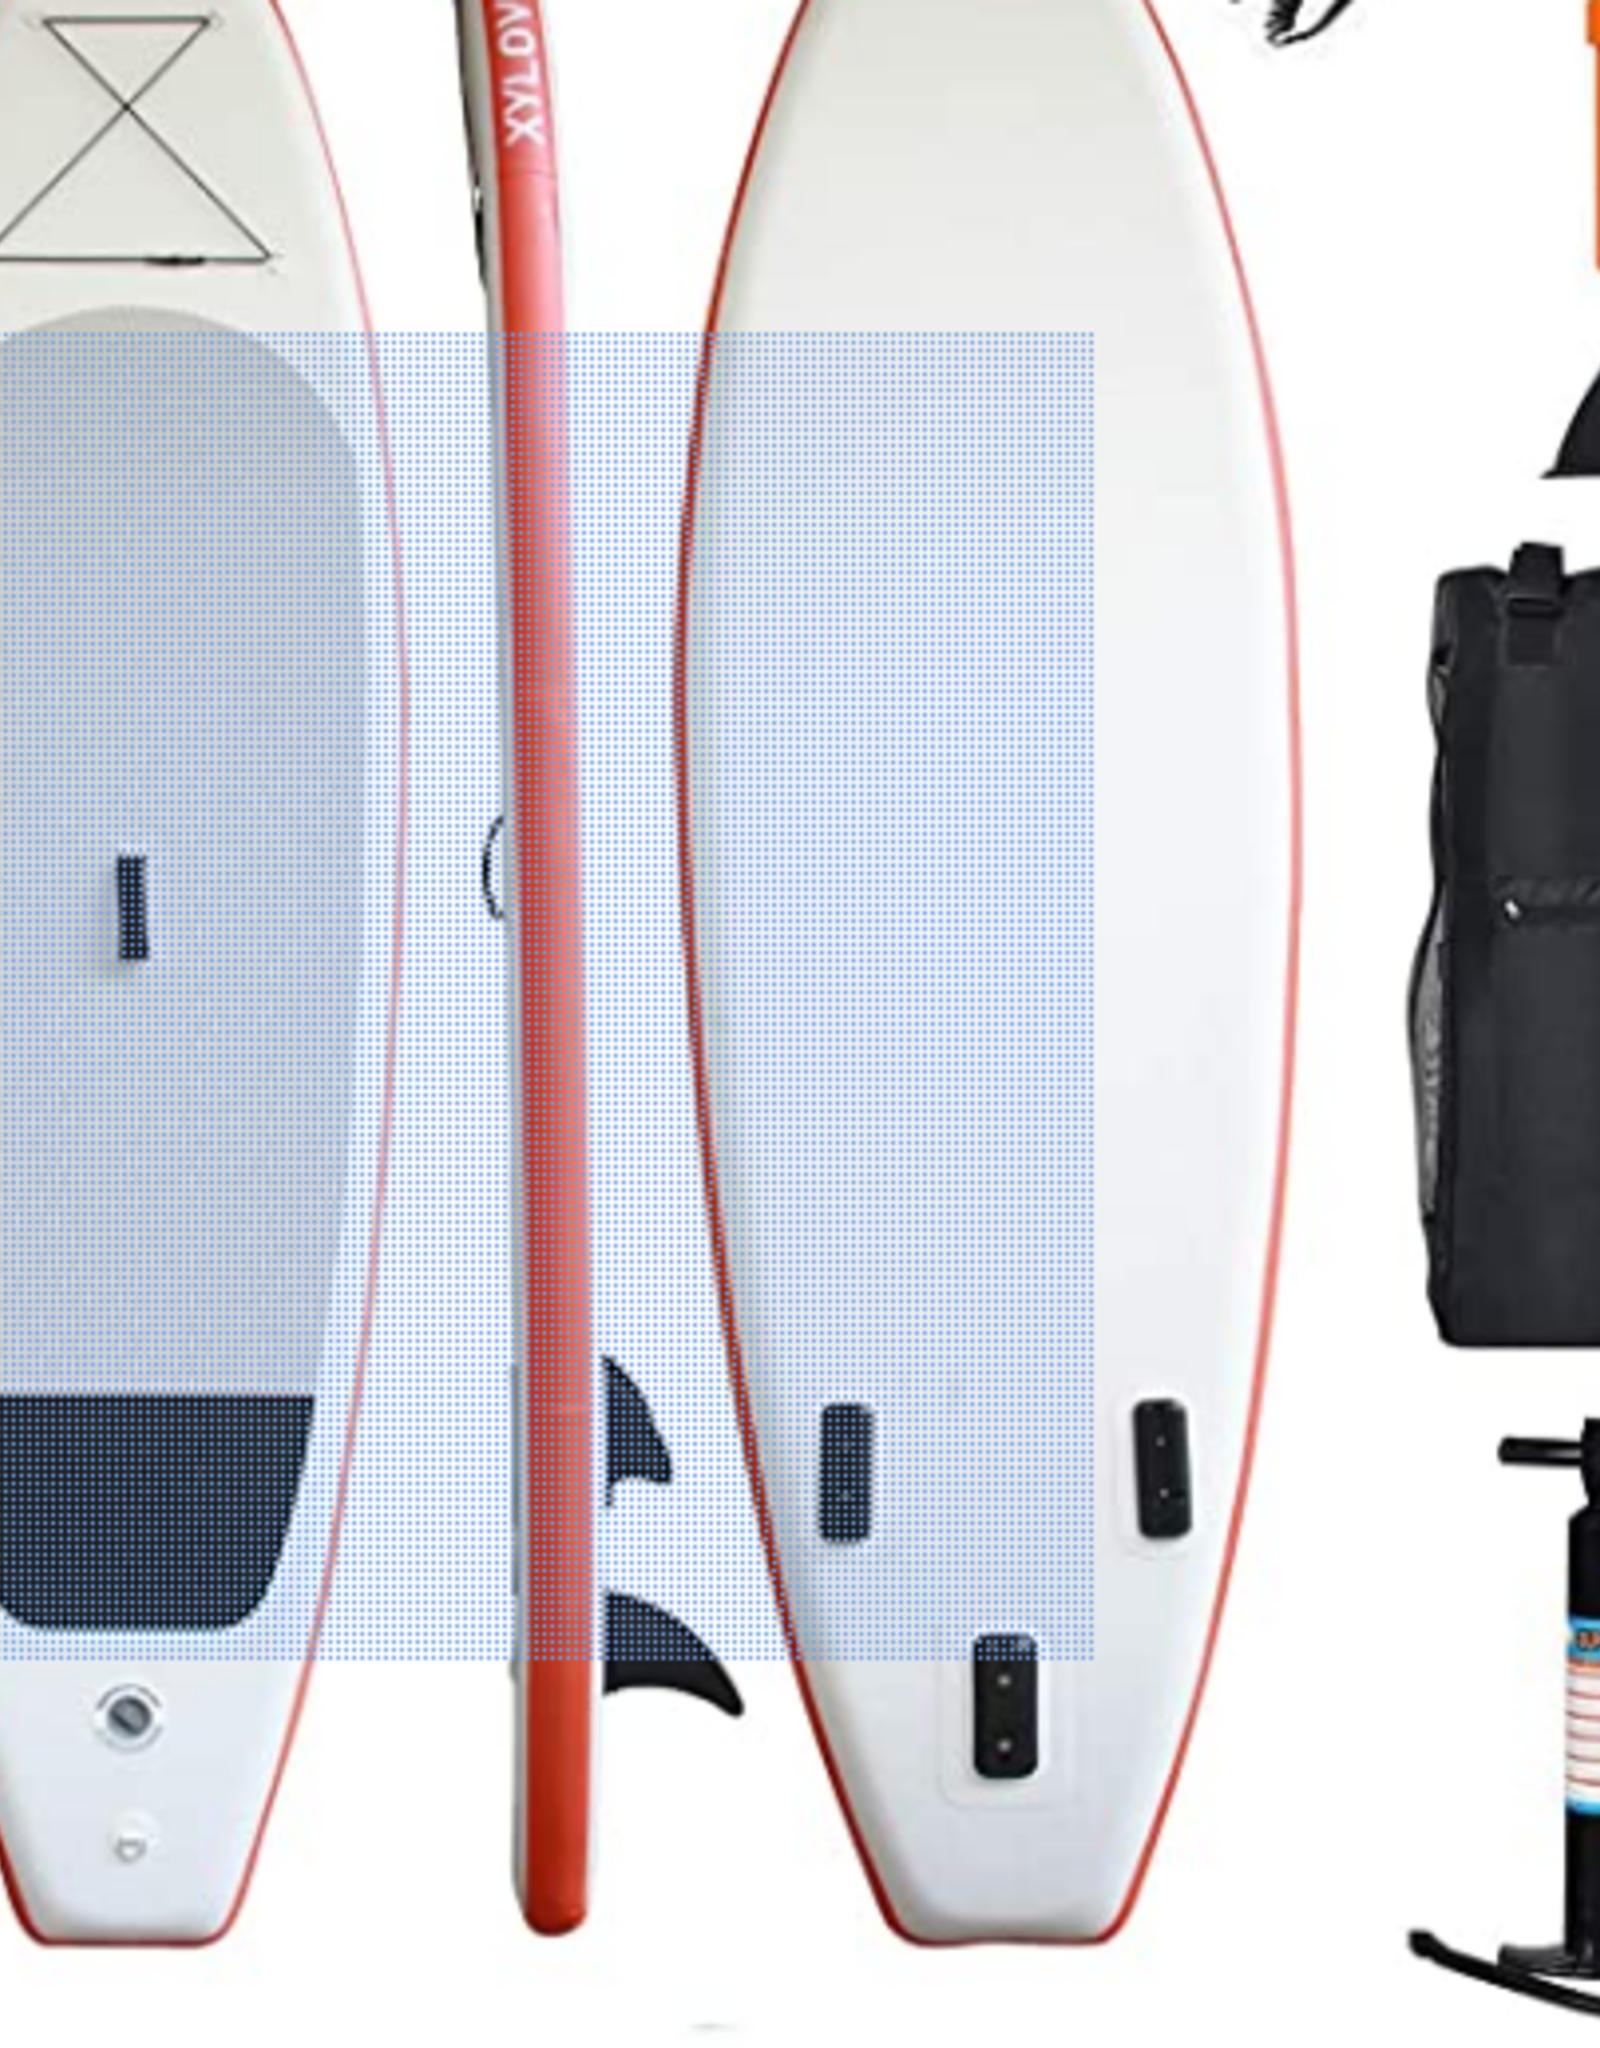 XYLOVE Paddleboard Orange 10.5'(Paggaie+sac+pompe)